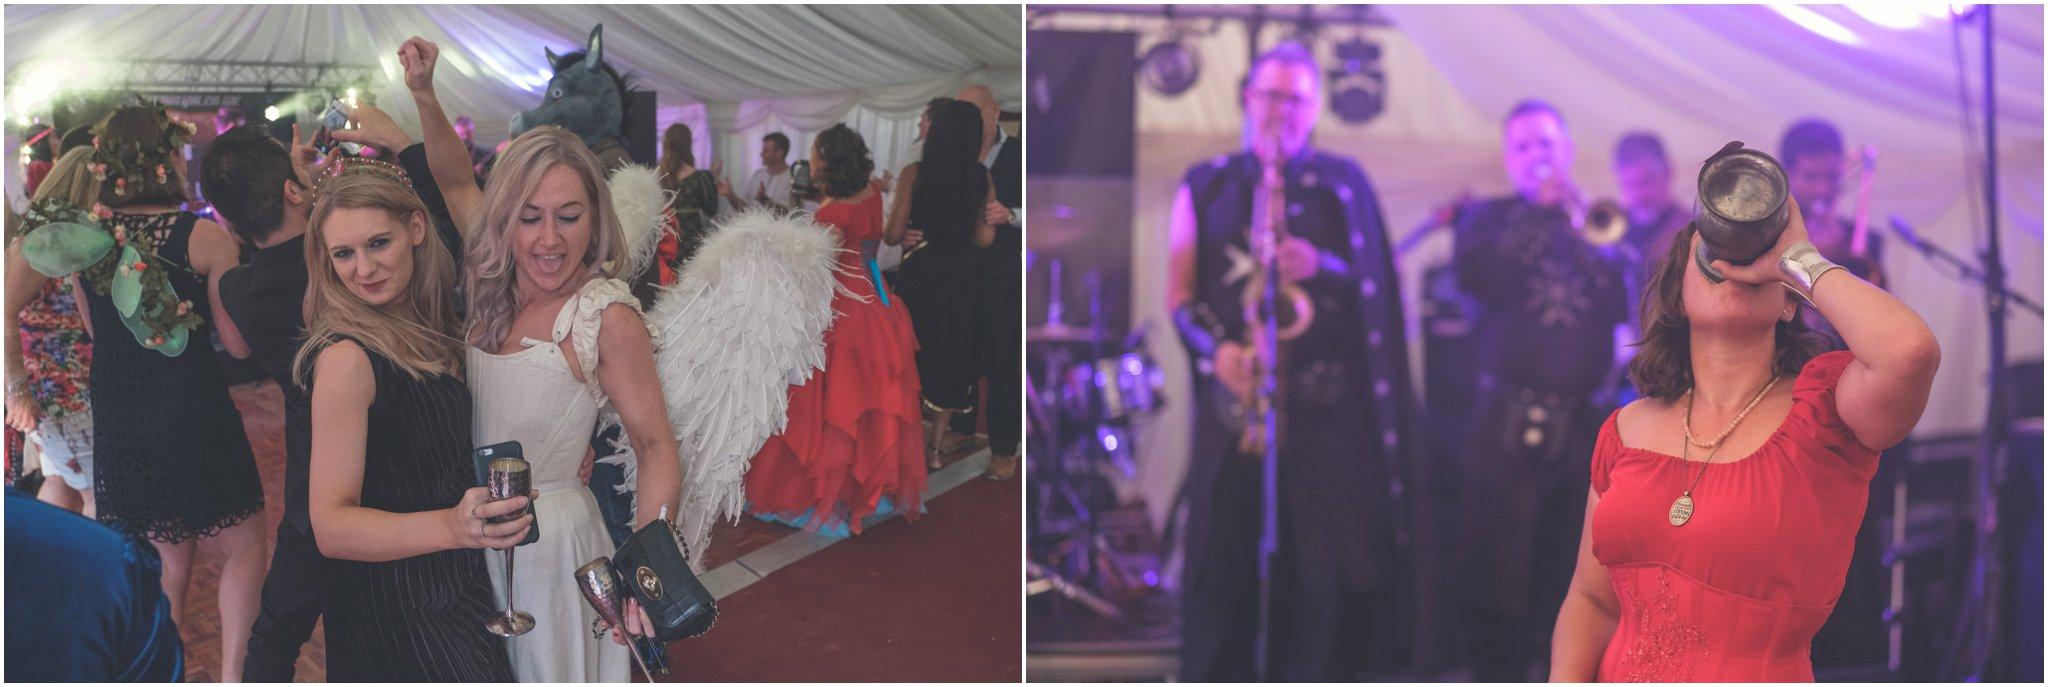 Stratford-Upon-Avon-Wedding - Robin Ball Photography-141.jpg